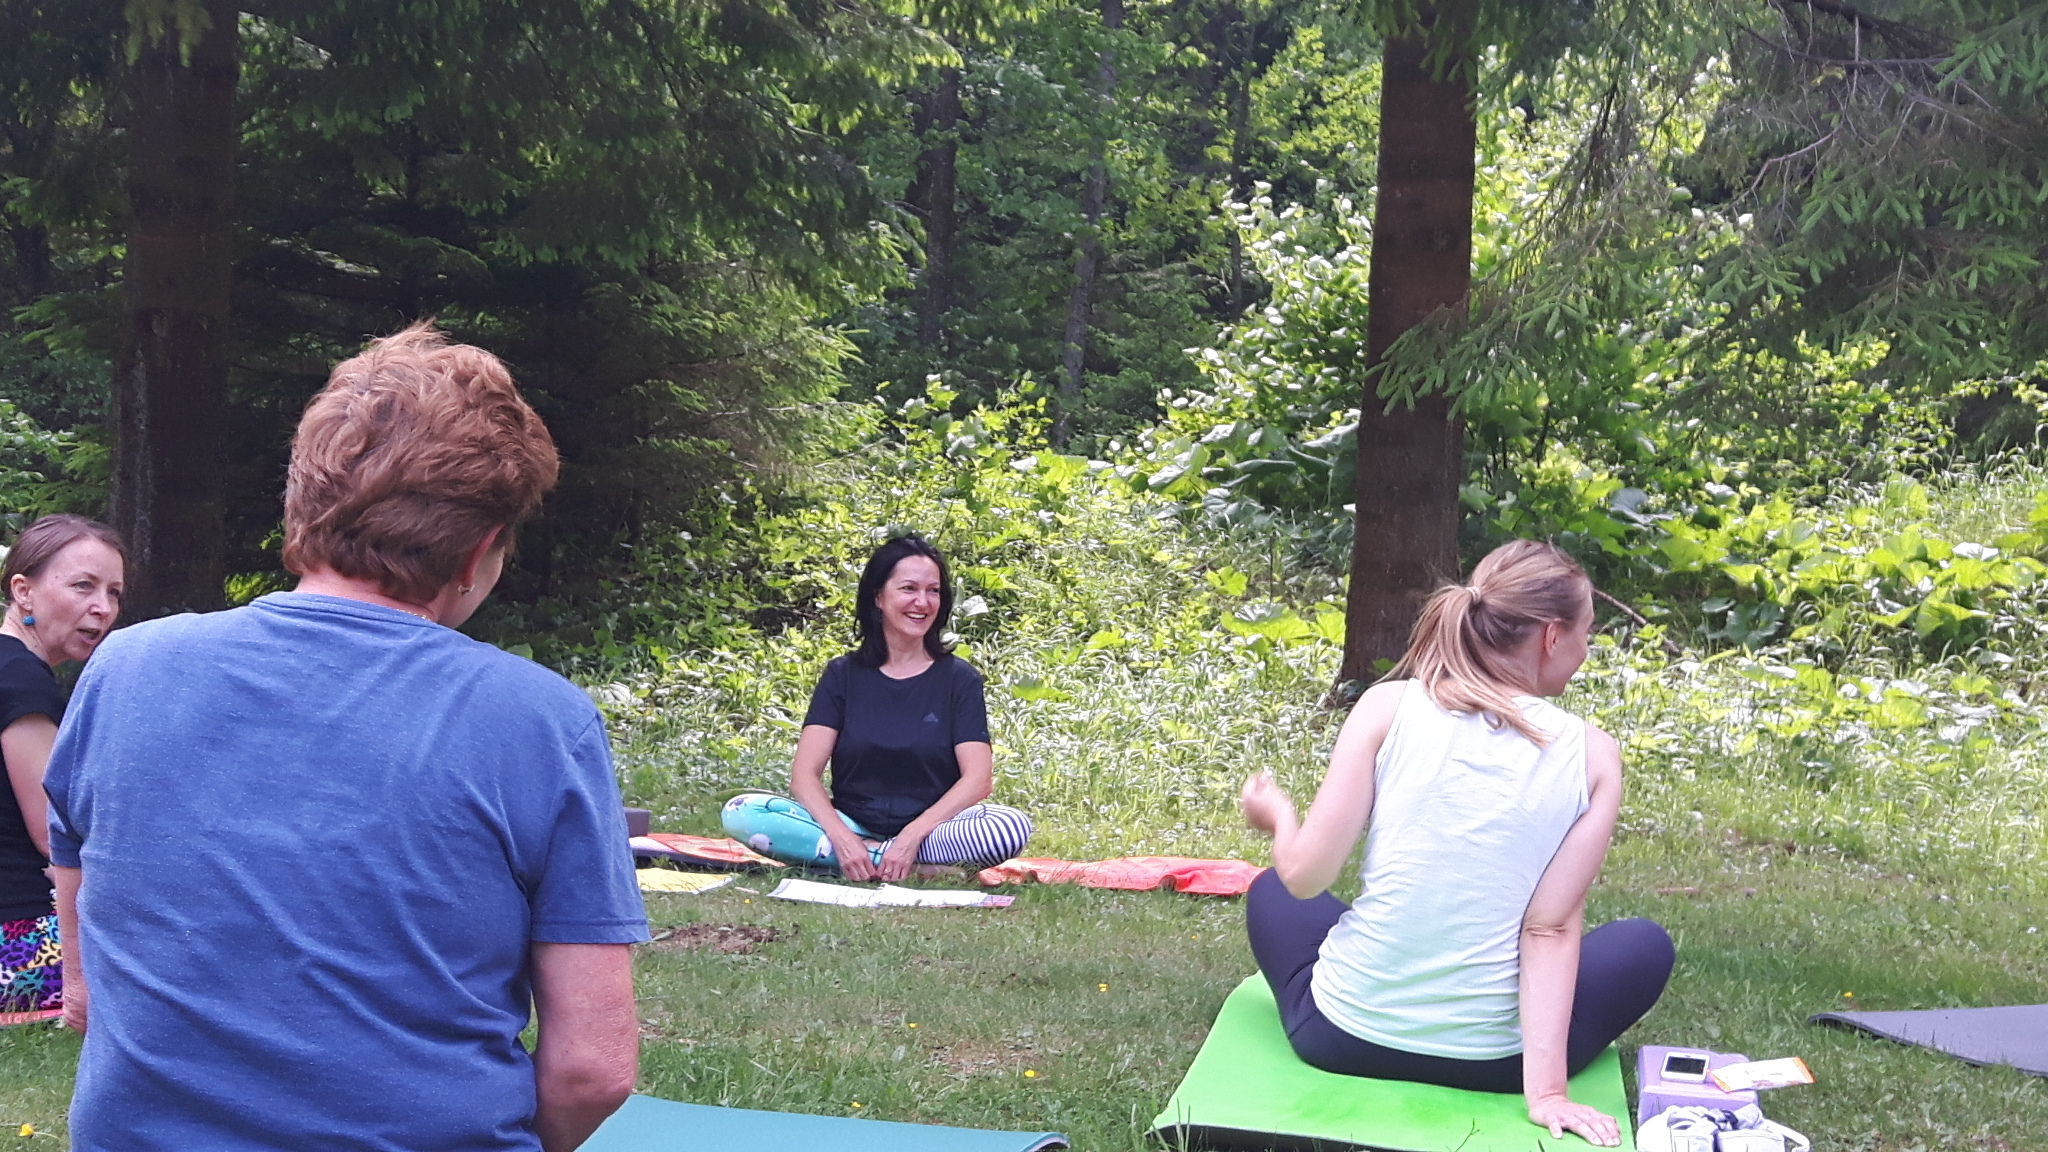 hormonalna-joga-kurzy-lektorka-jana-sramkova